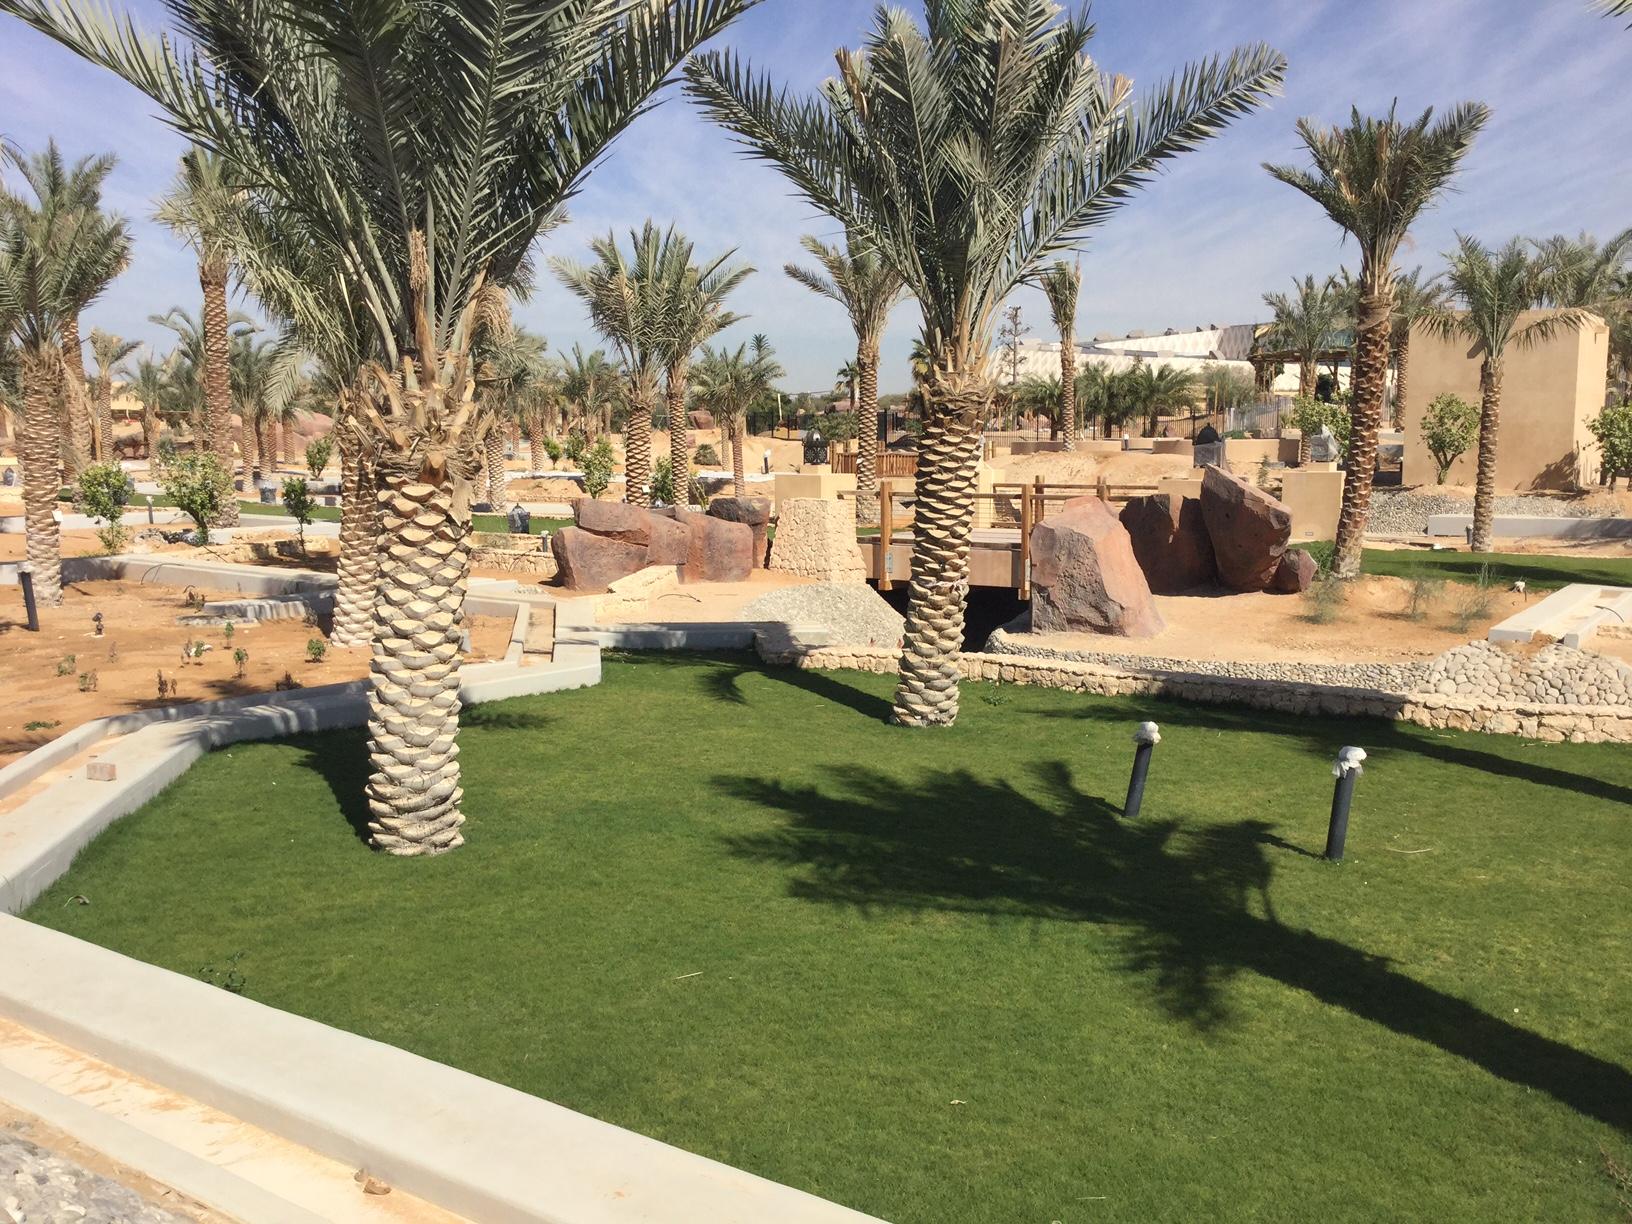 Al Ain Wildlife Park & Resort